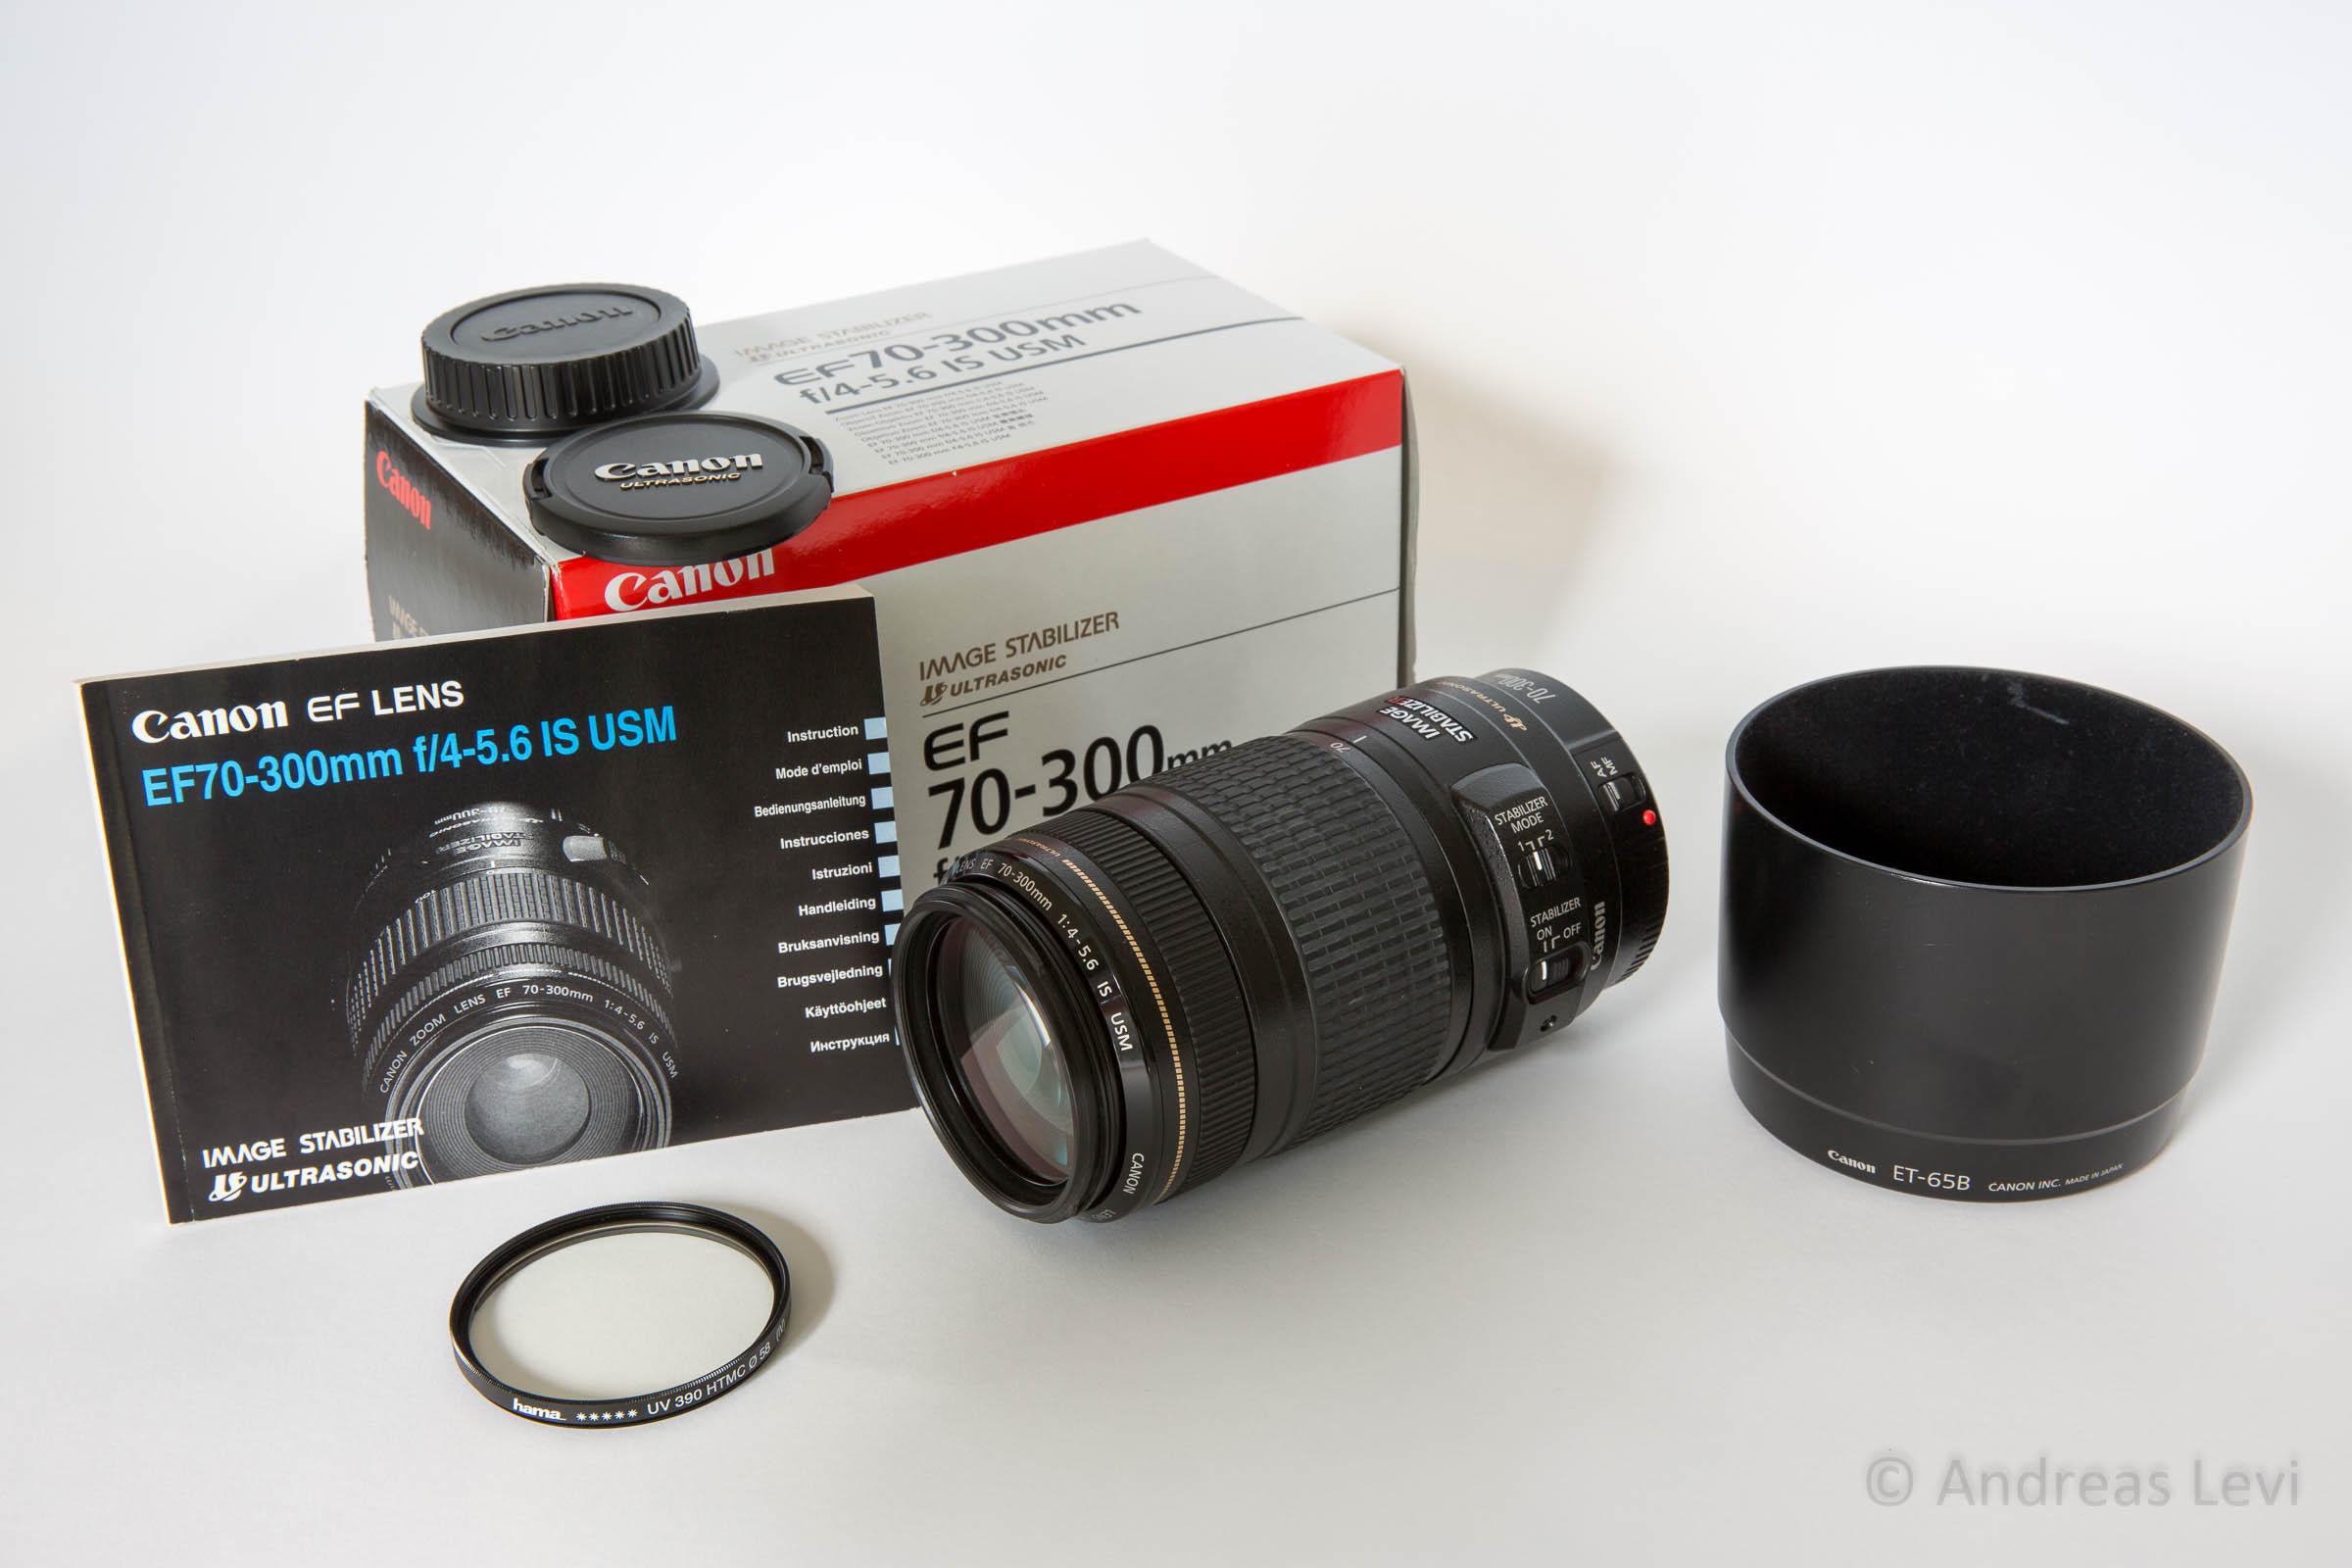 Canon EF 70-300mm f/4-5.6 IS USM abzugeben